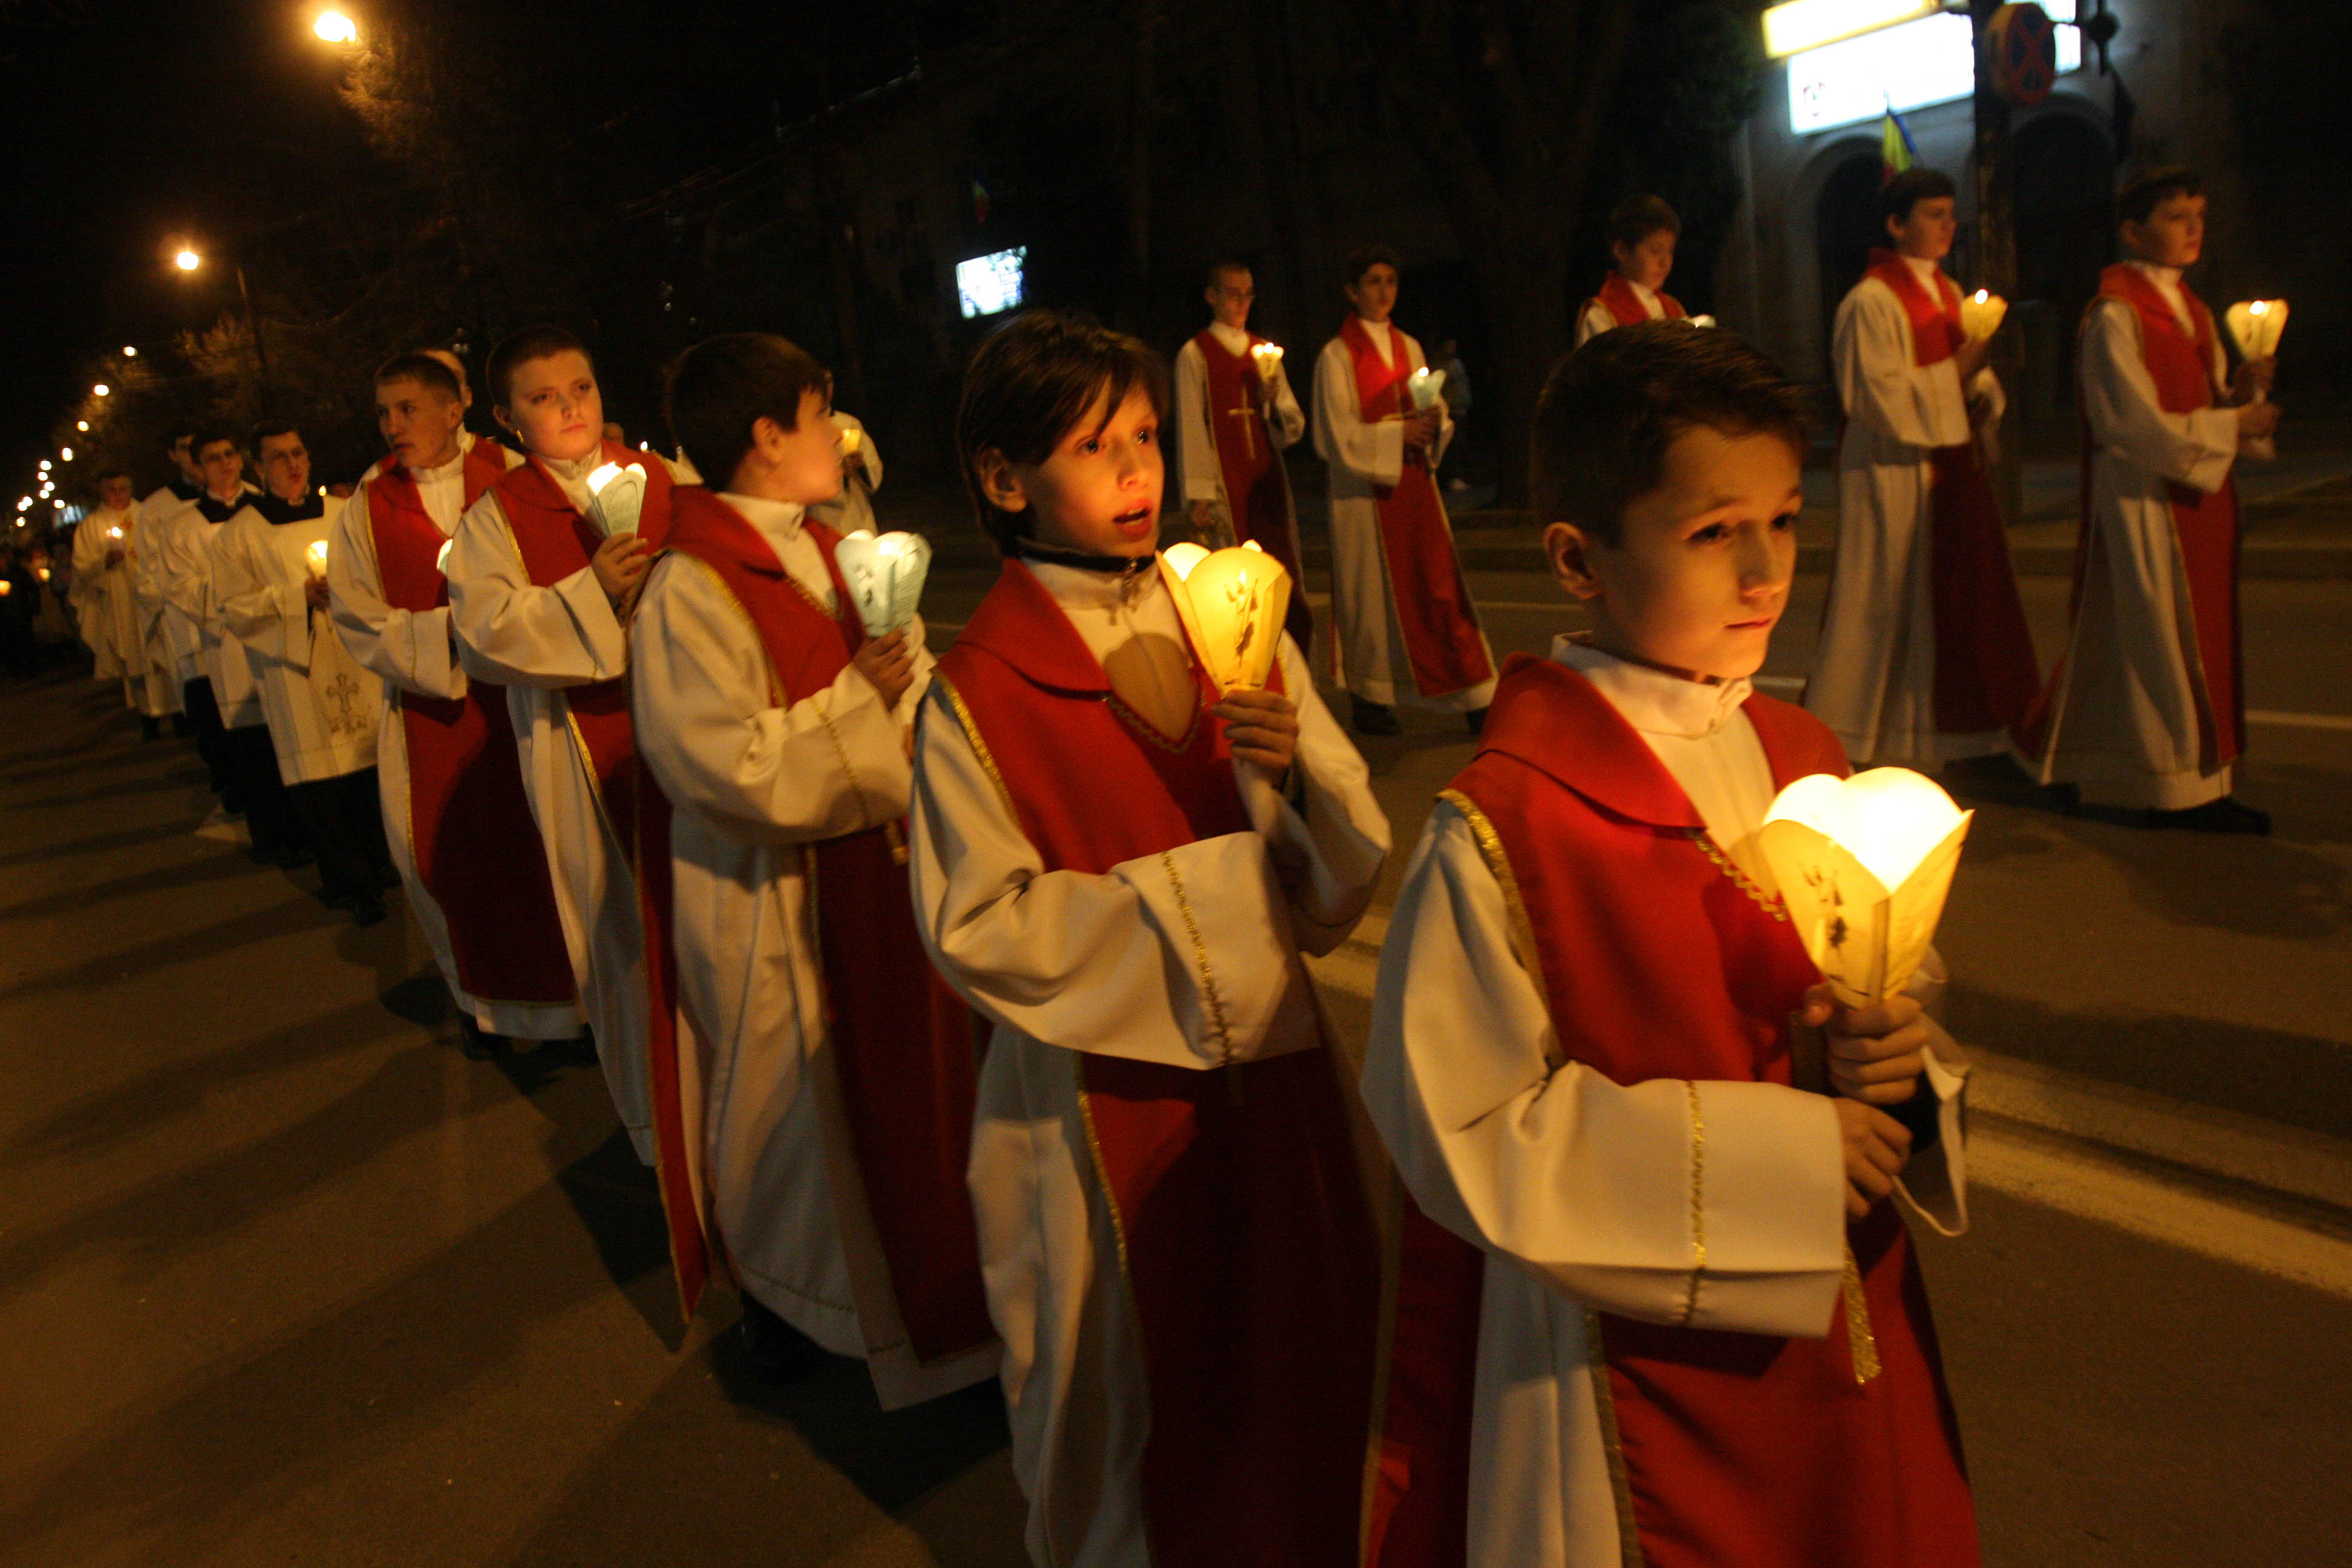 Hristos a inviat! Milioane de romani au participat la slujba de Inviere